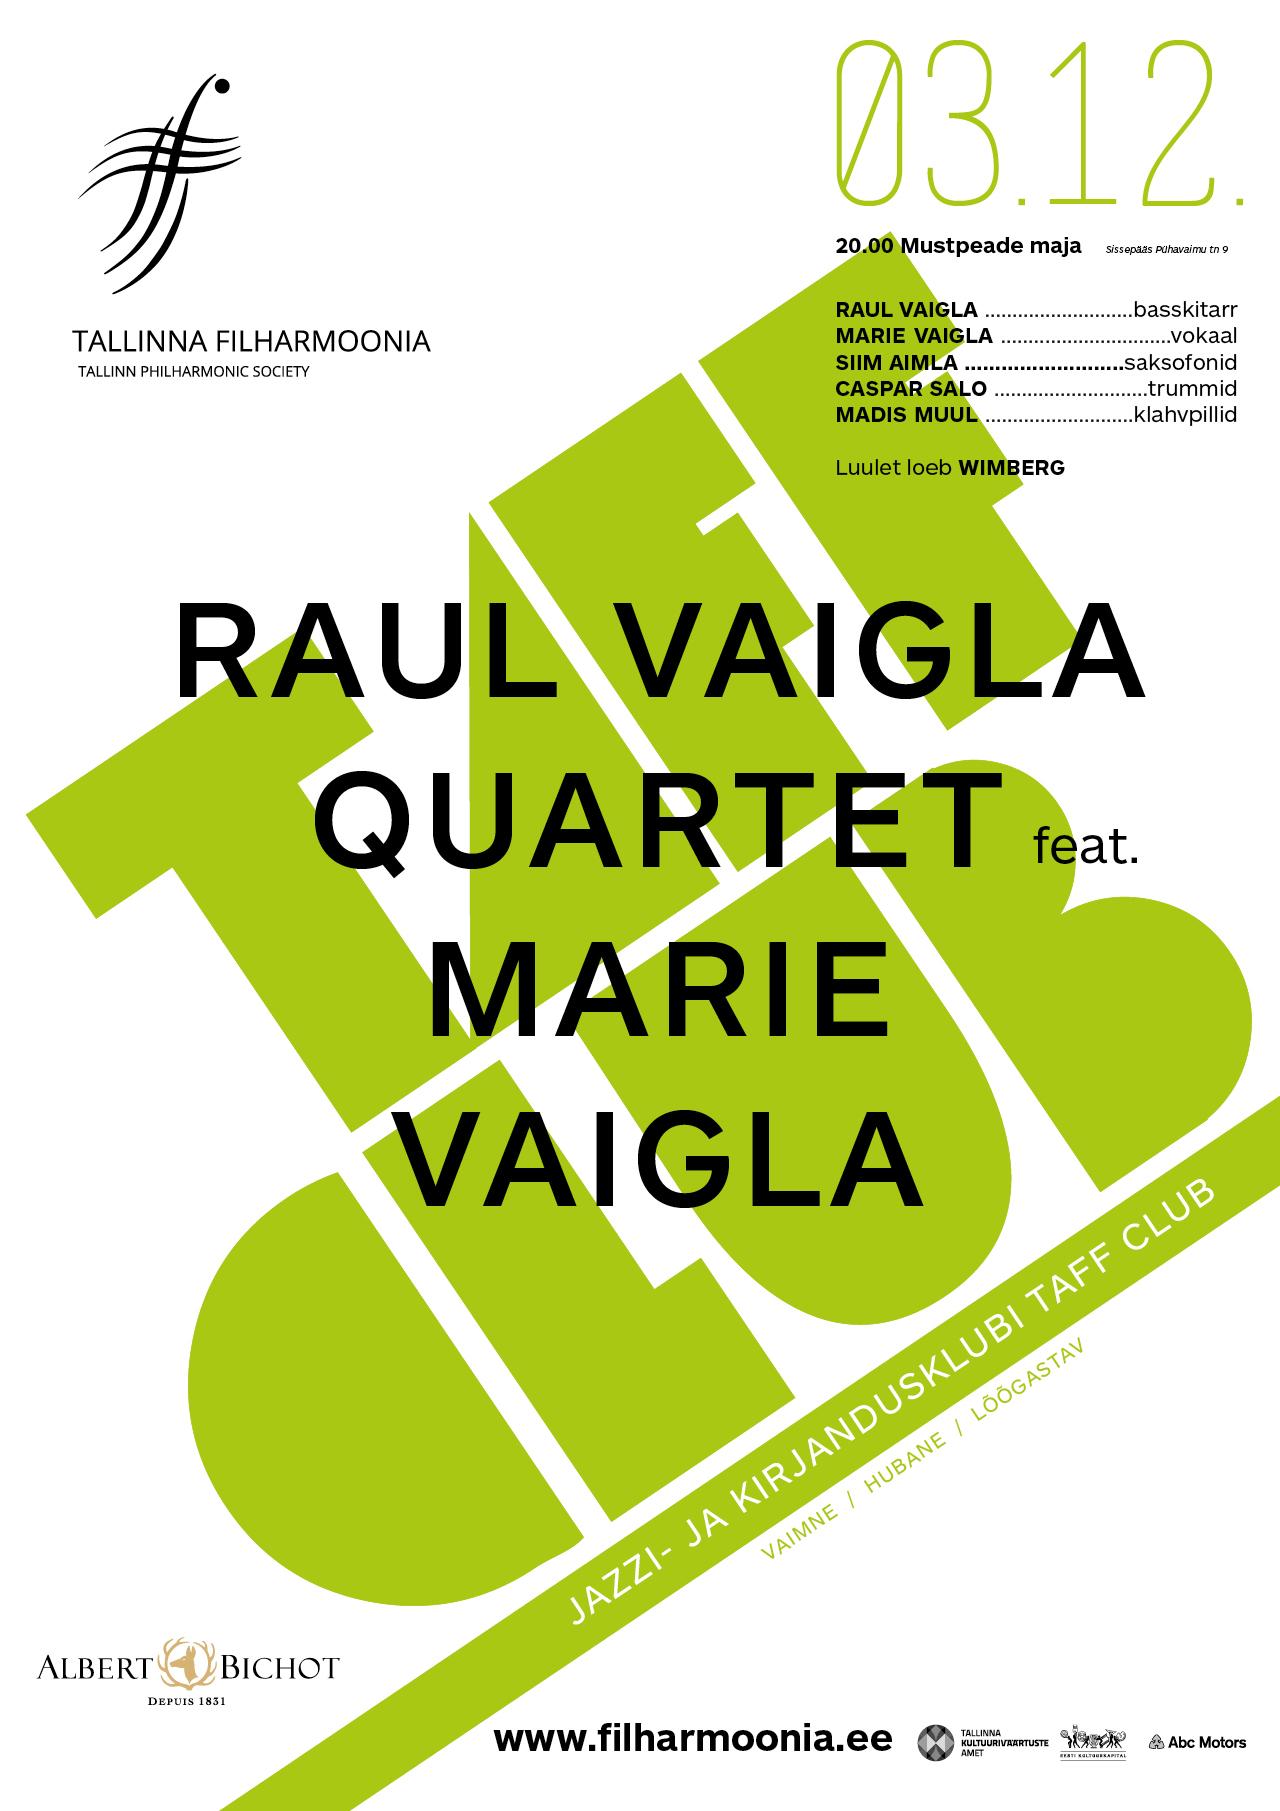 TAFF CLUB. RAUL VAIGLA QUARTET feat. MARIE VAIGLA